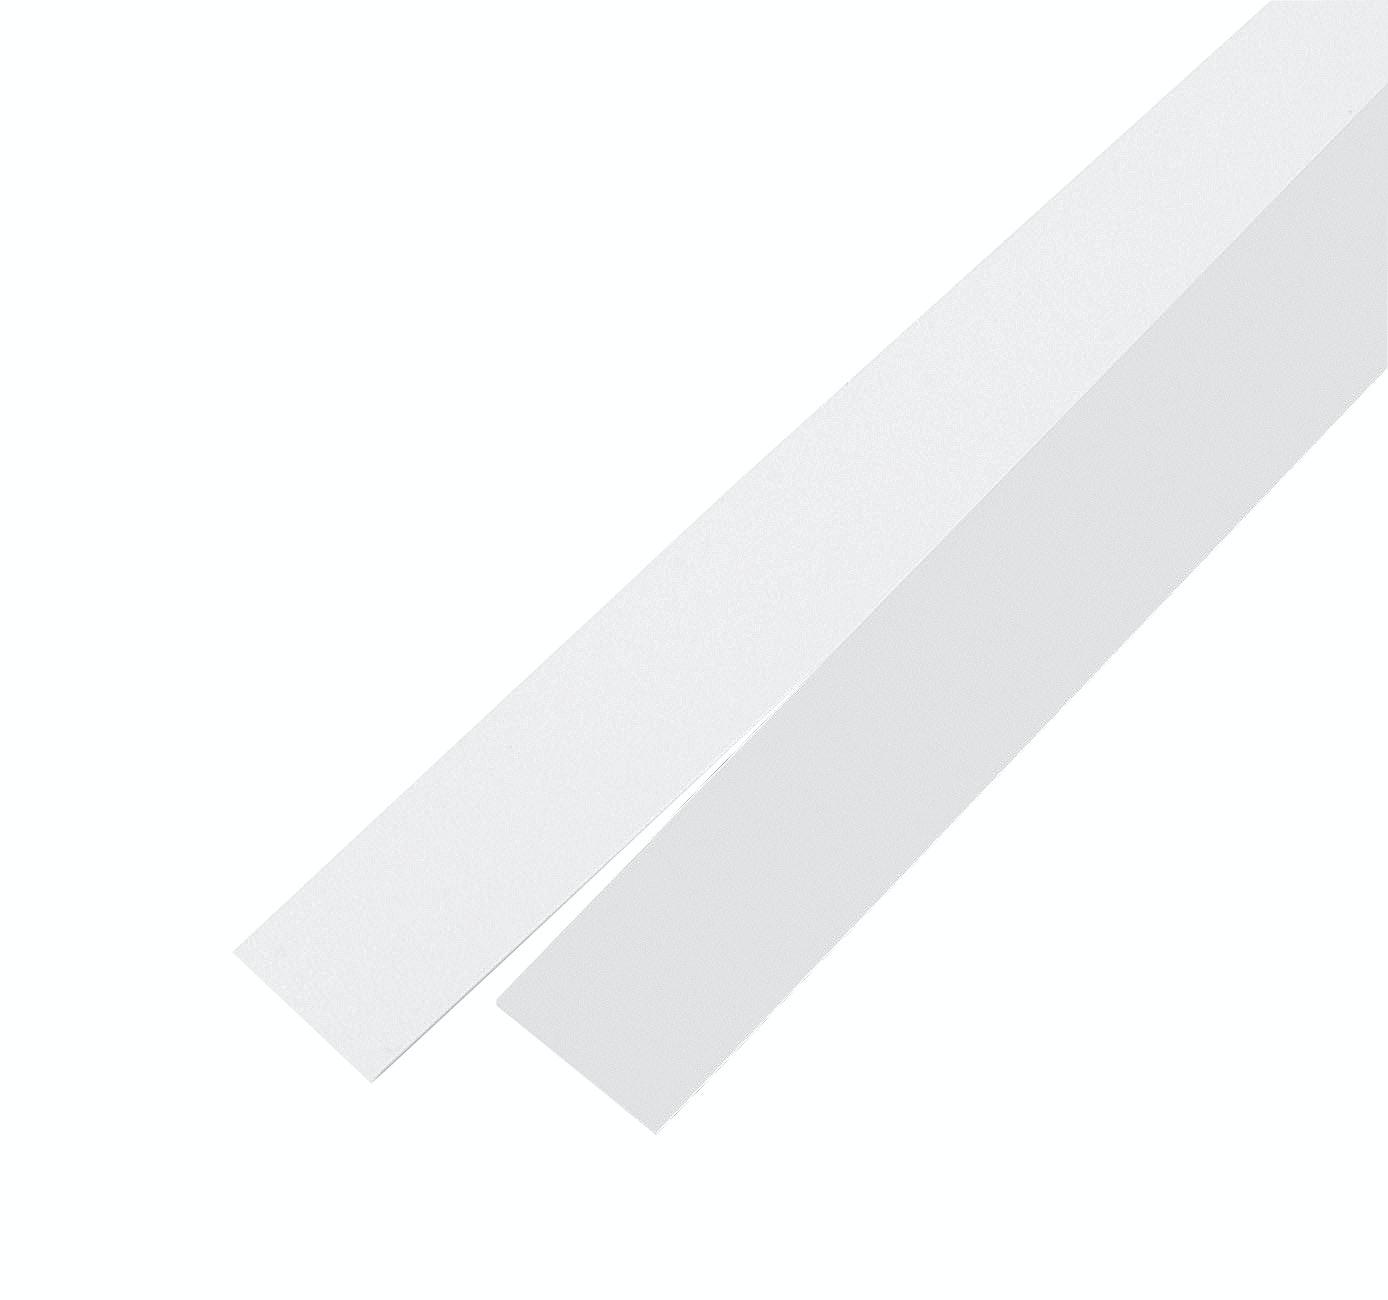 Kantlist Lundbergs Vit 19mmX5m